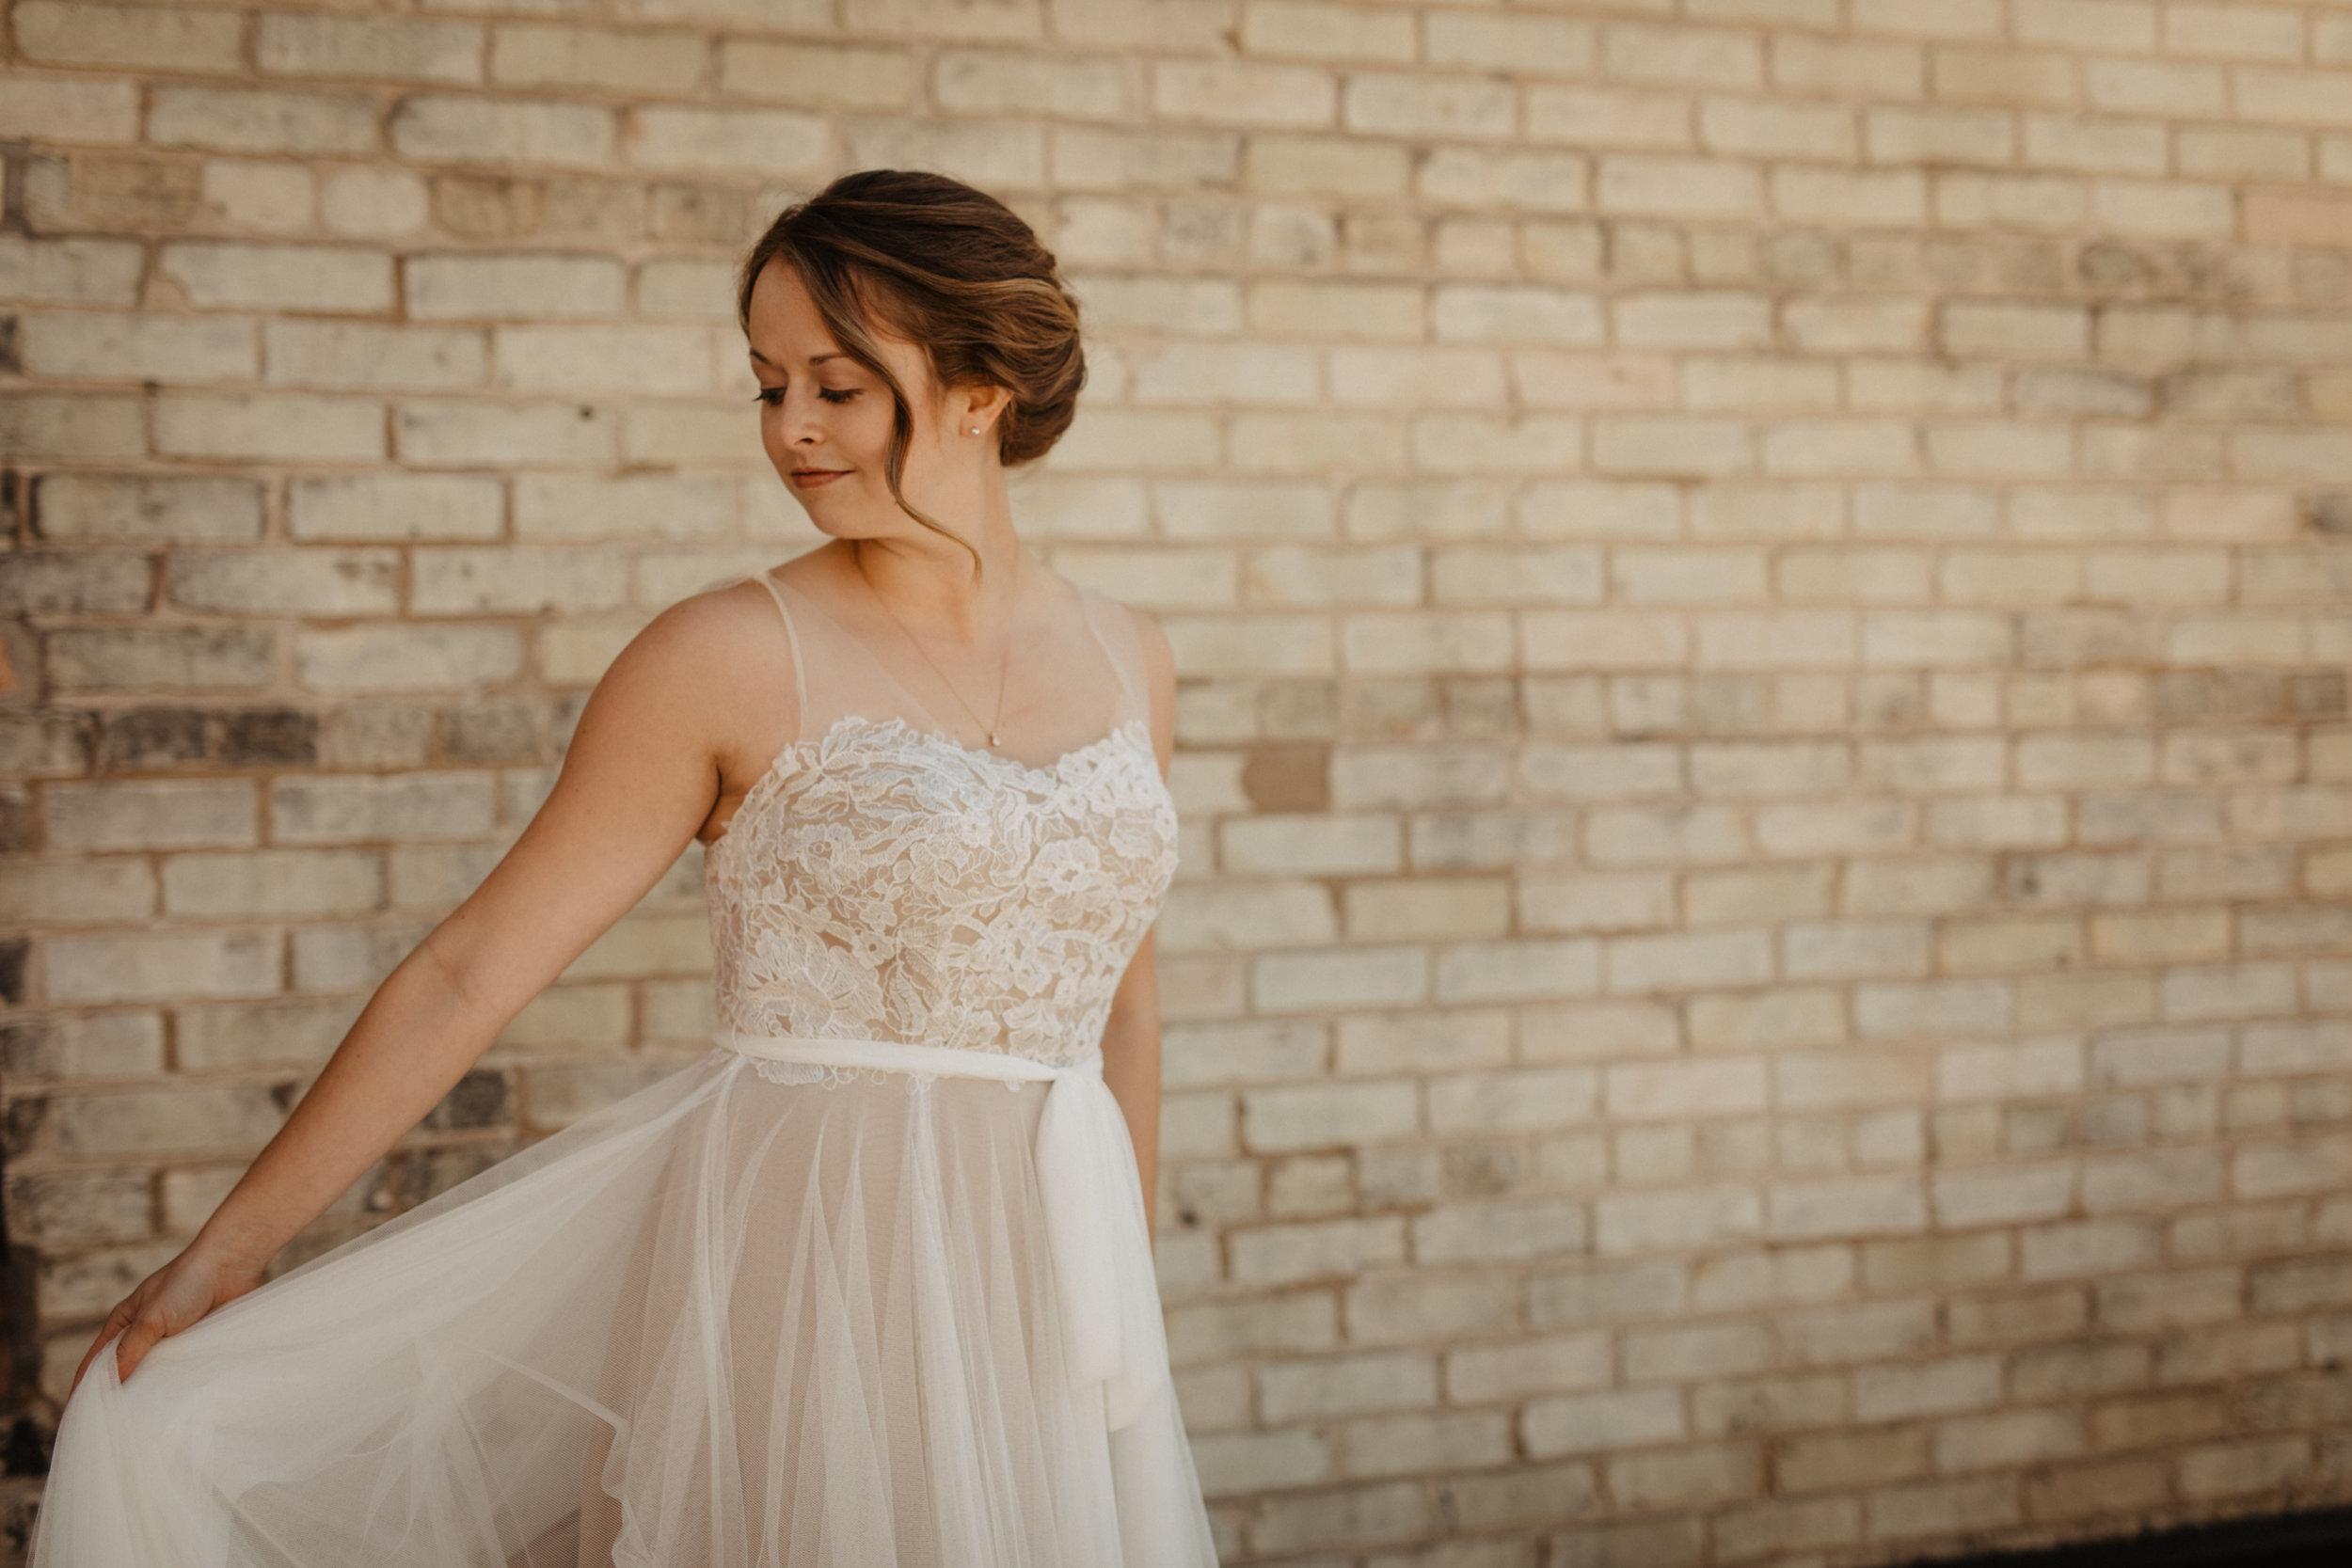 Bride-Wedding-Day-01